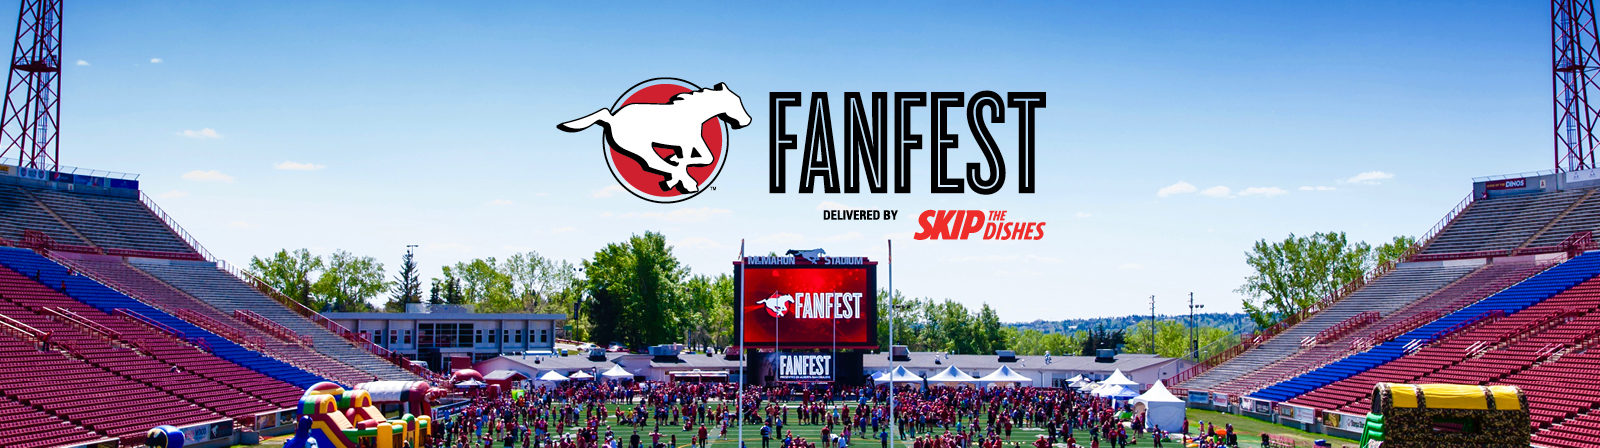 Stampeders Fanfest Stampede Breakfast 2019